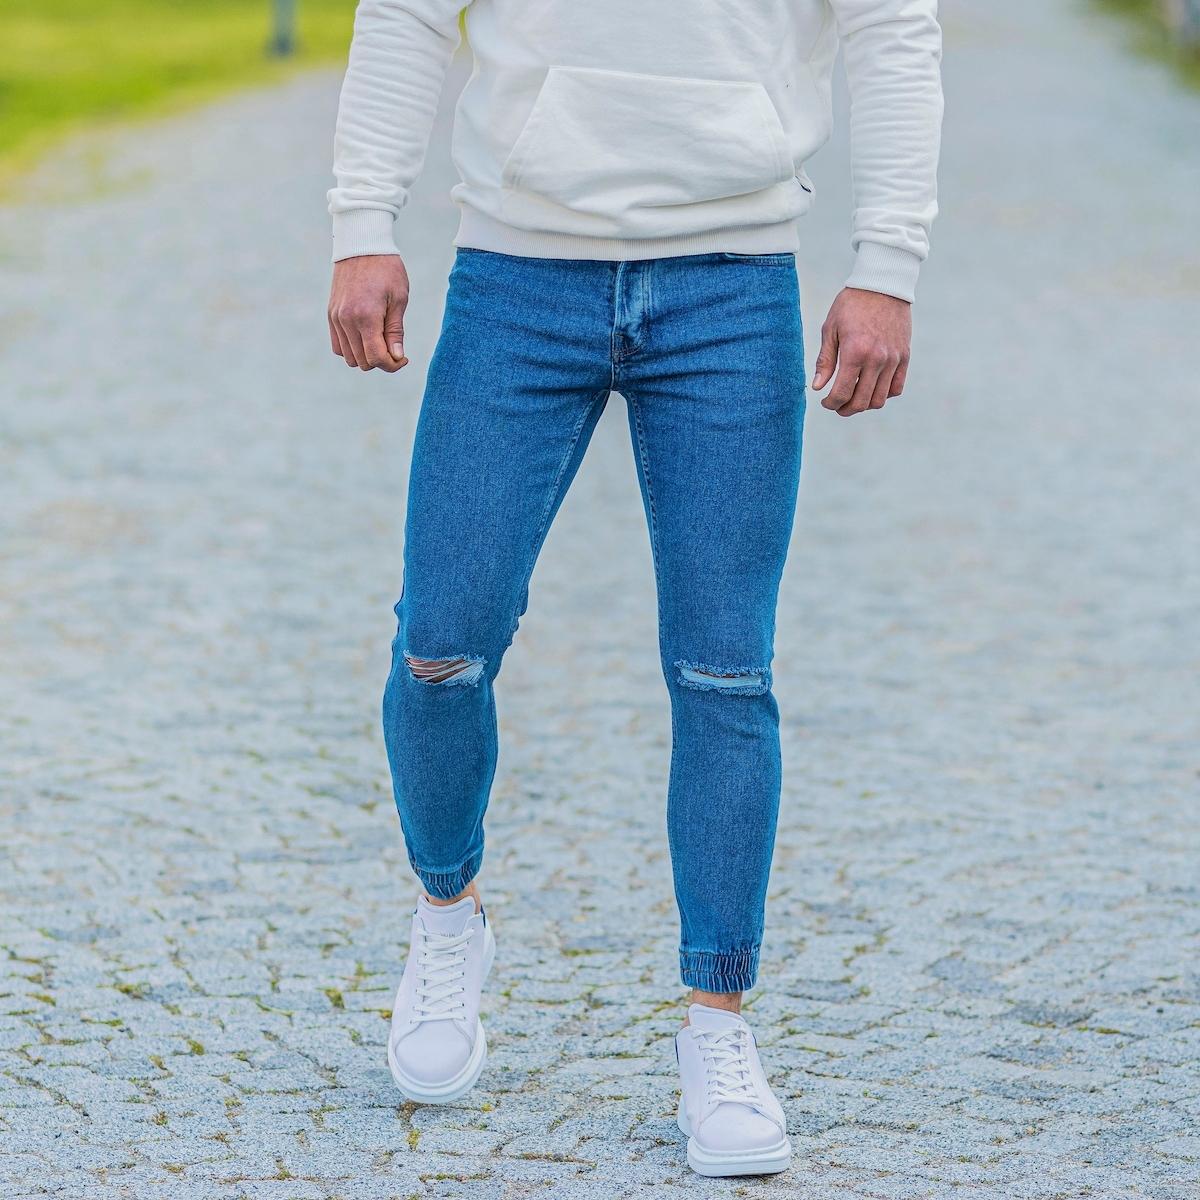 Erkek Lastik Paça Dizi Yırtık Mavi Kot Pantolon